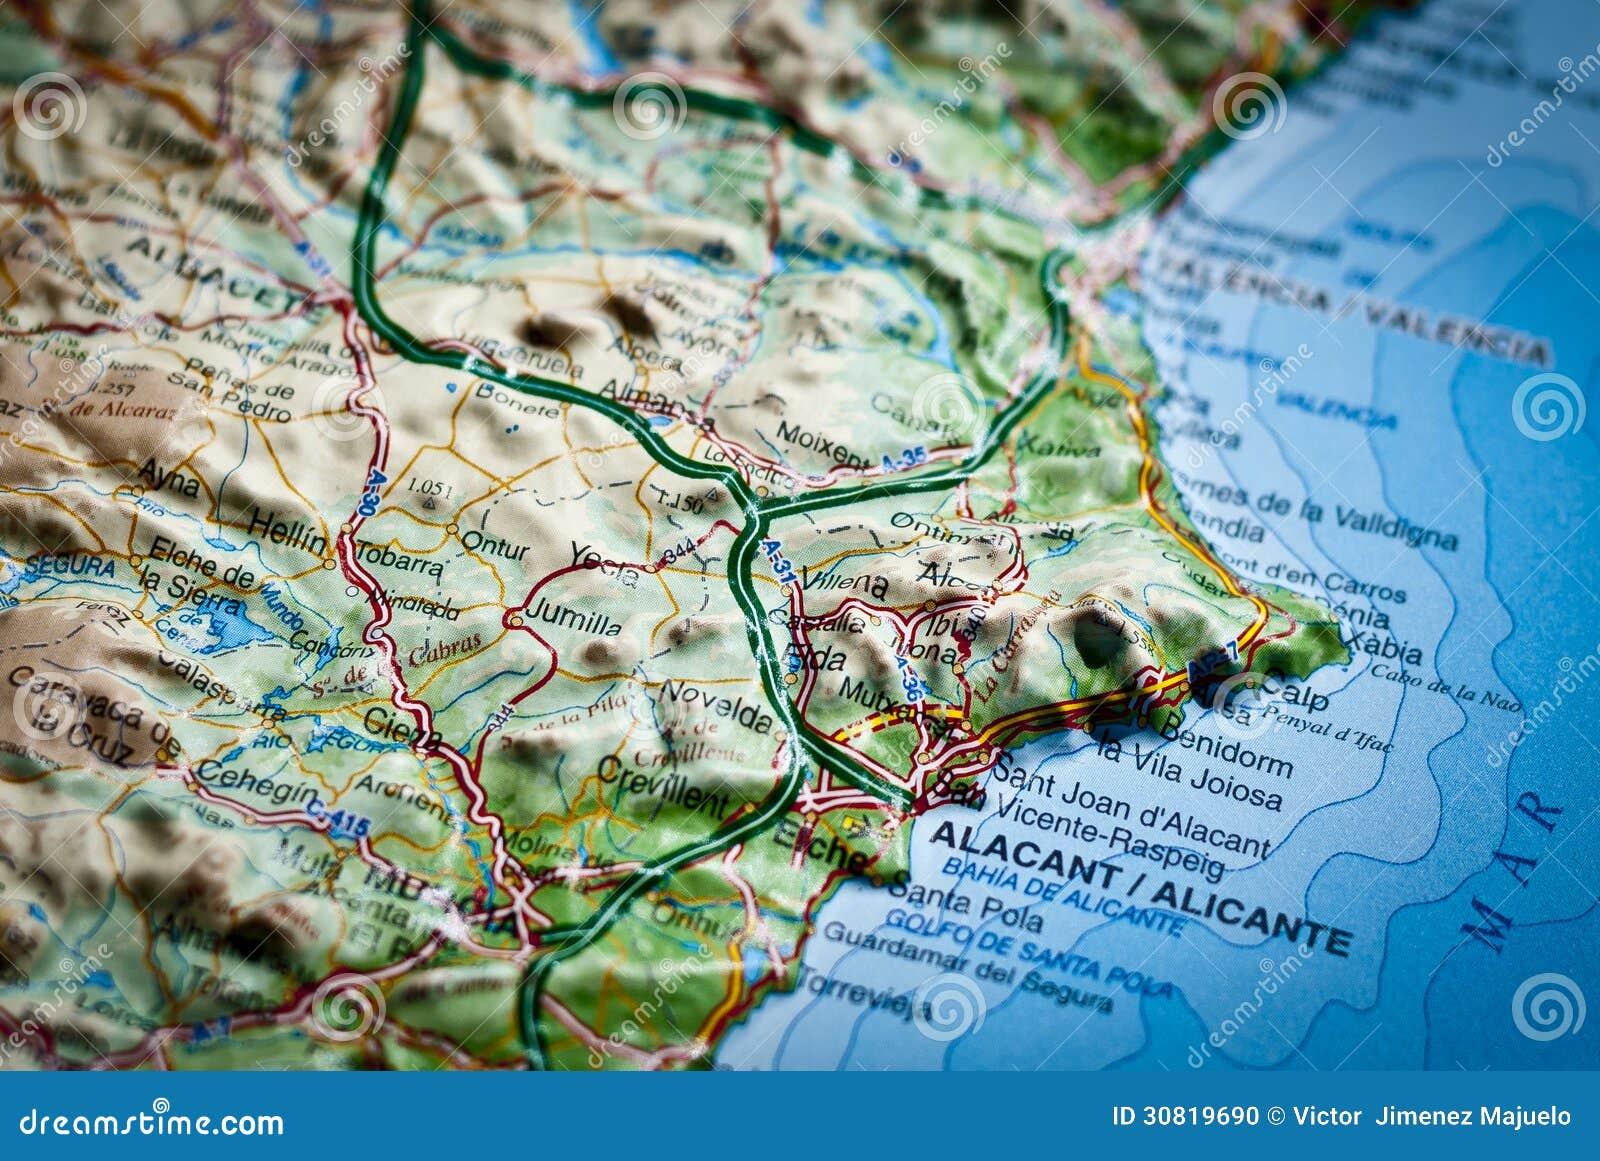 Spanish Map Of Costa Blanca Alicante Spain Stock Photo